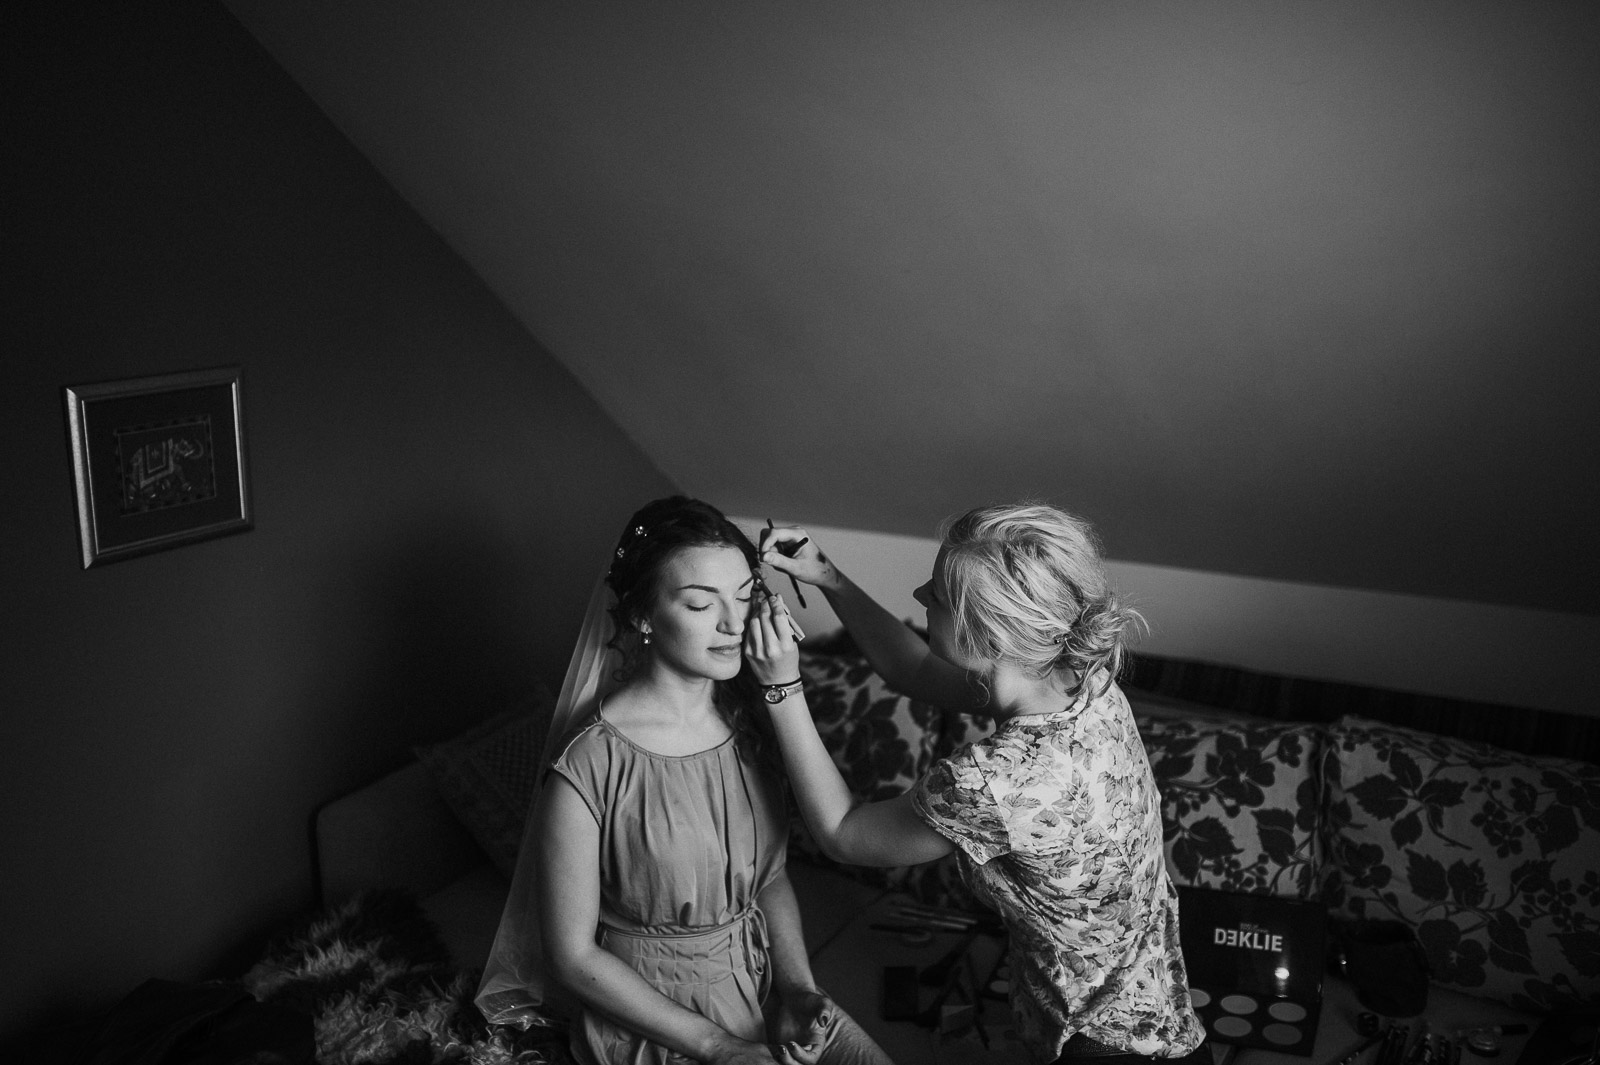 Valdur_Rosenvald_Johanna_pulmafotograaf_Mait_Juriado_M&J_Studios-017